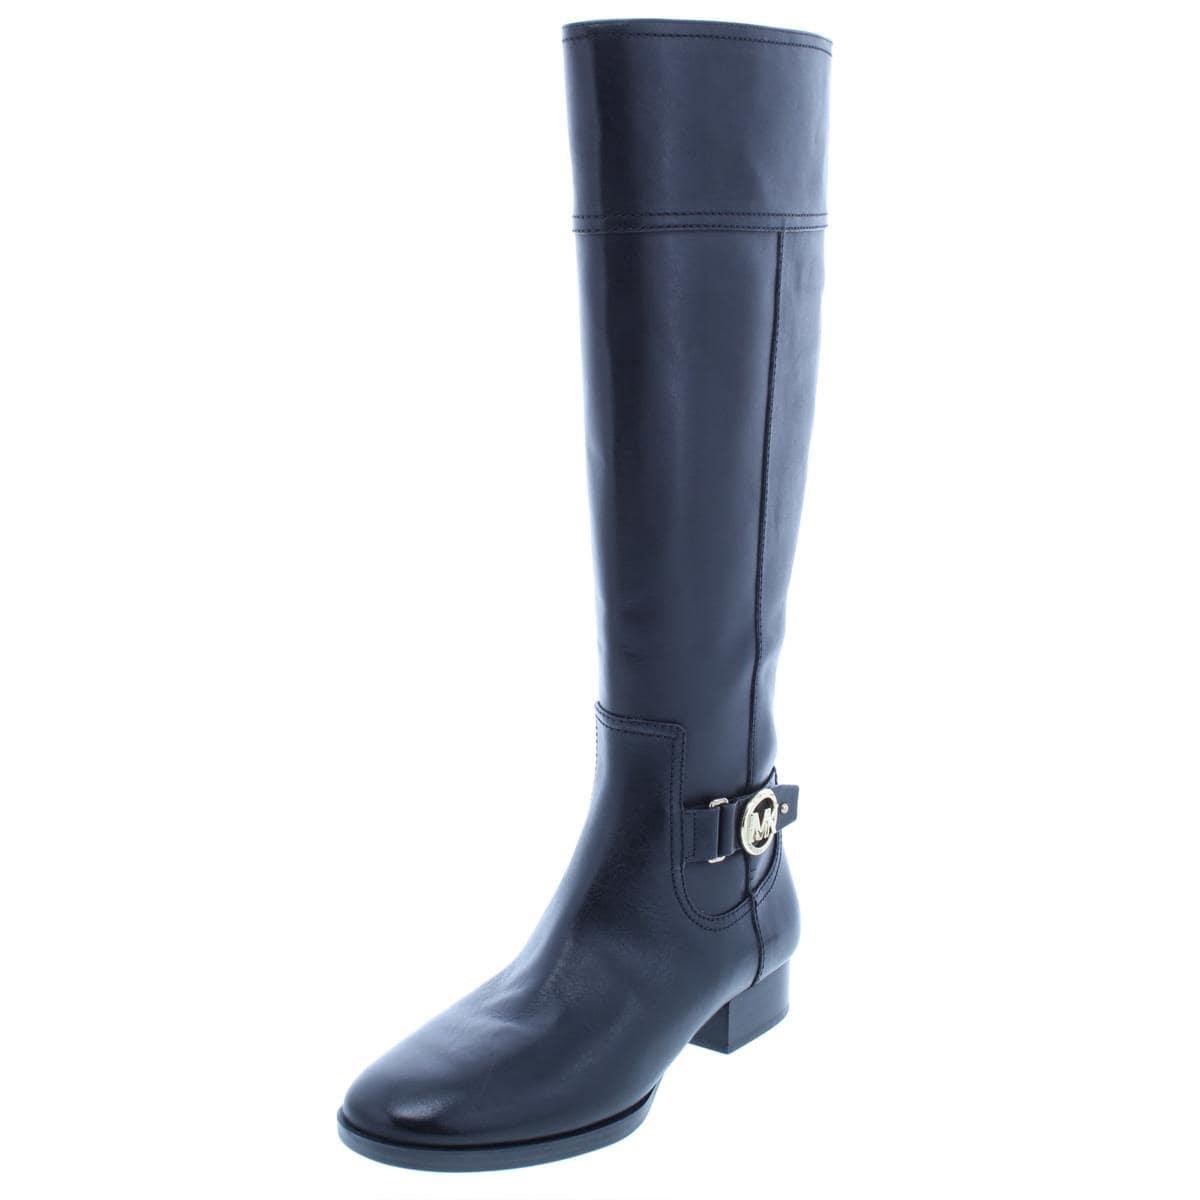 9e178dea4993 Shop MICHAEL Michael Kors Womens Harland Riding Boots Leather Knee ...